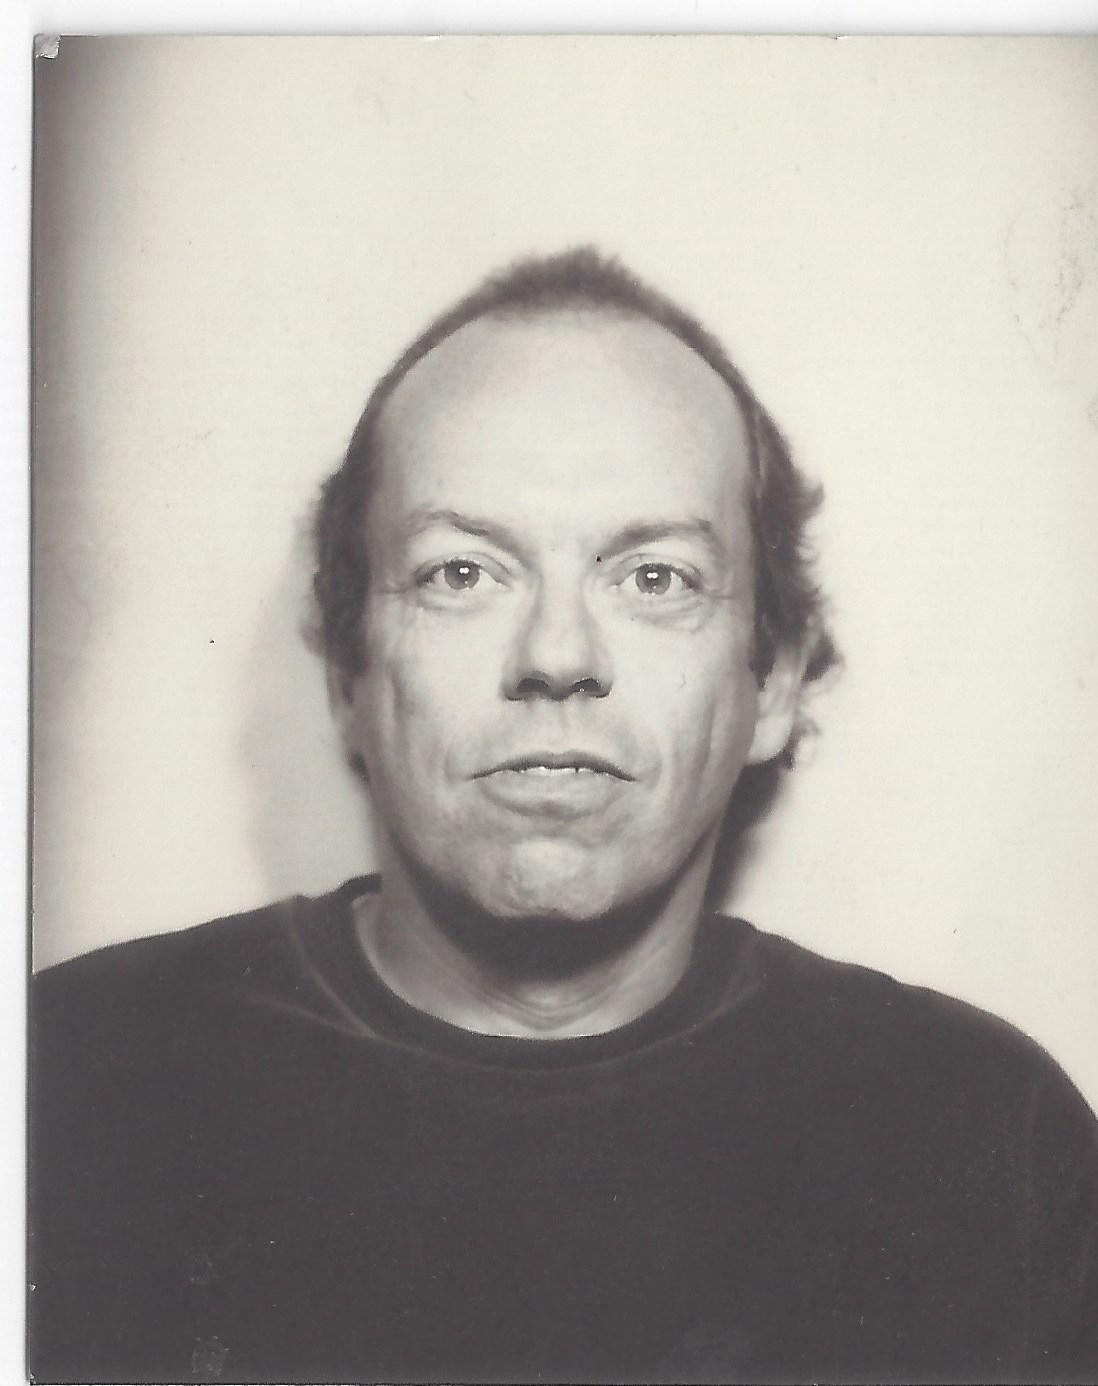 Photo Booth Self Portrait, circa 1990